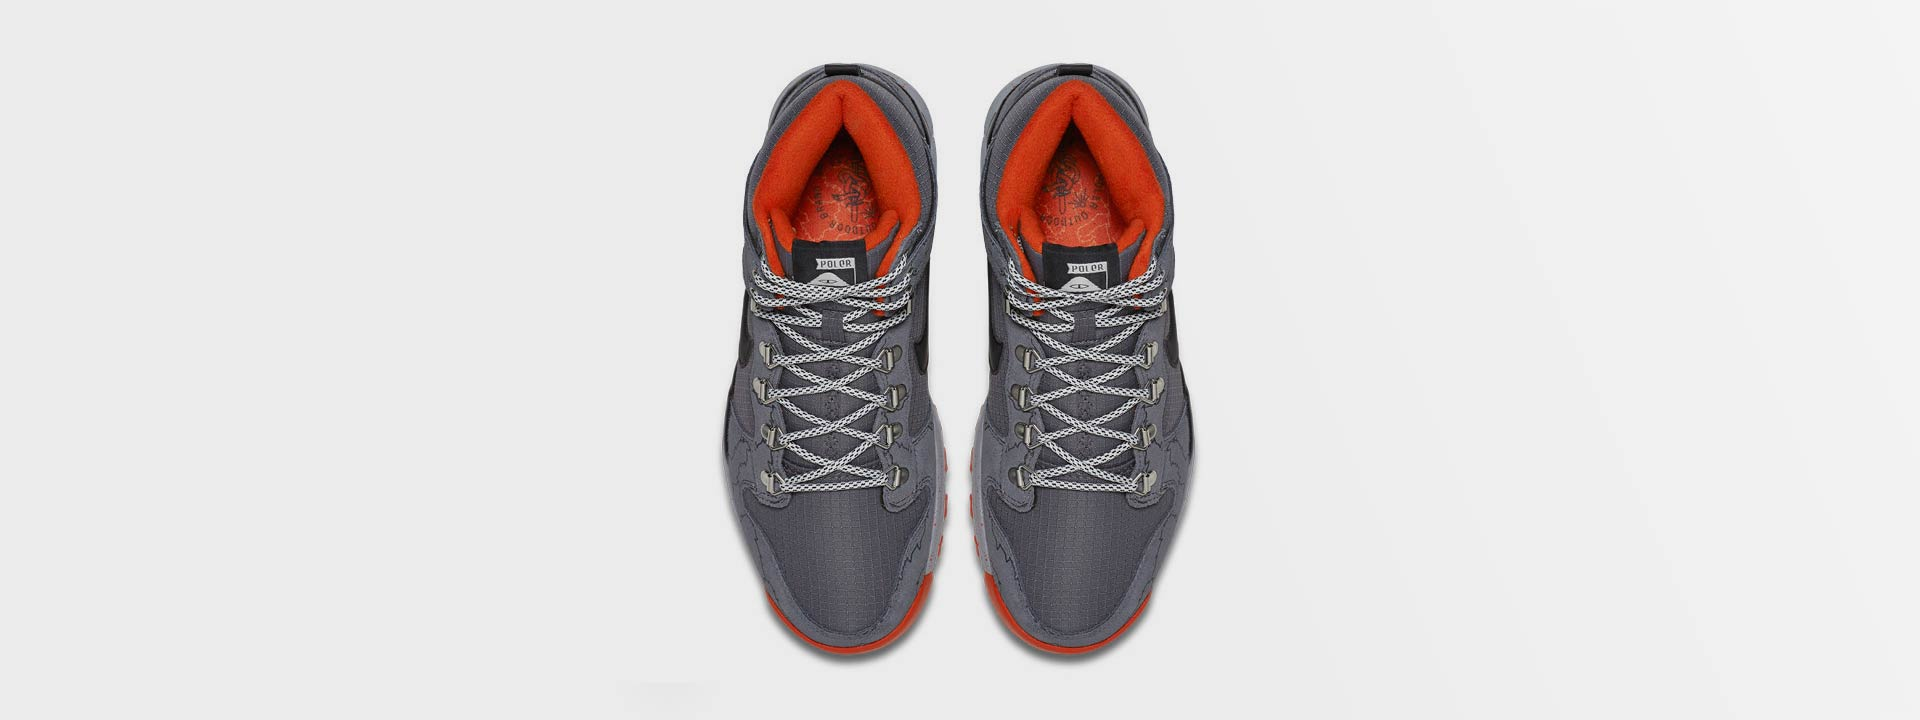 Ботинки Nike x Poler SB Dunk